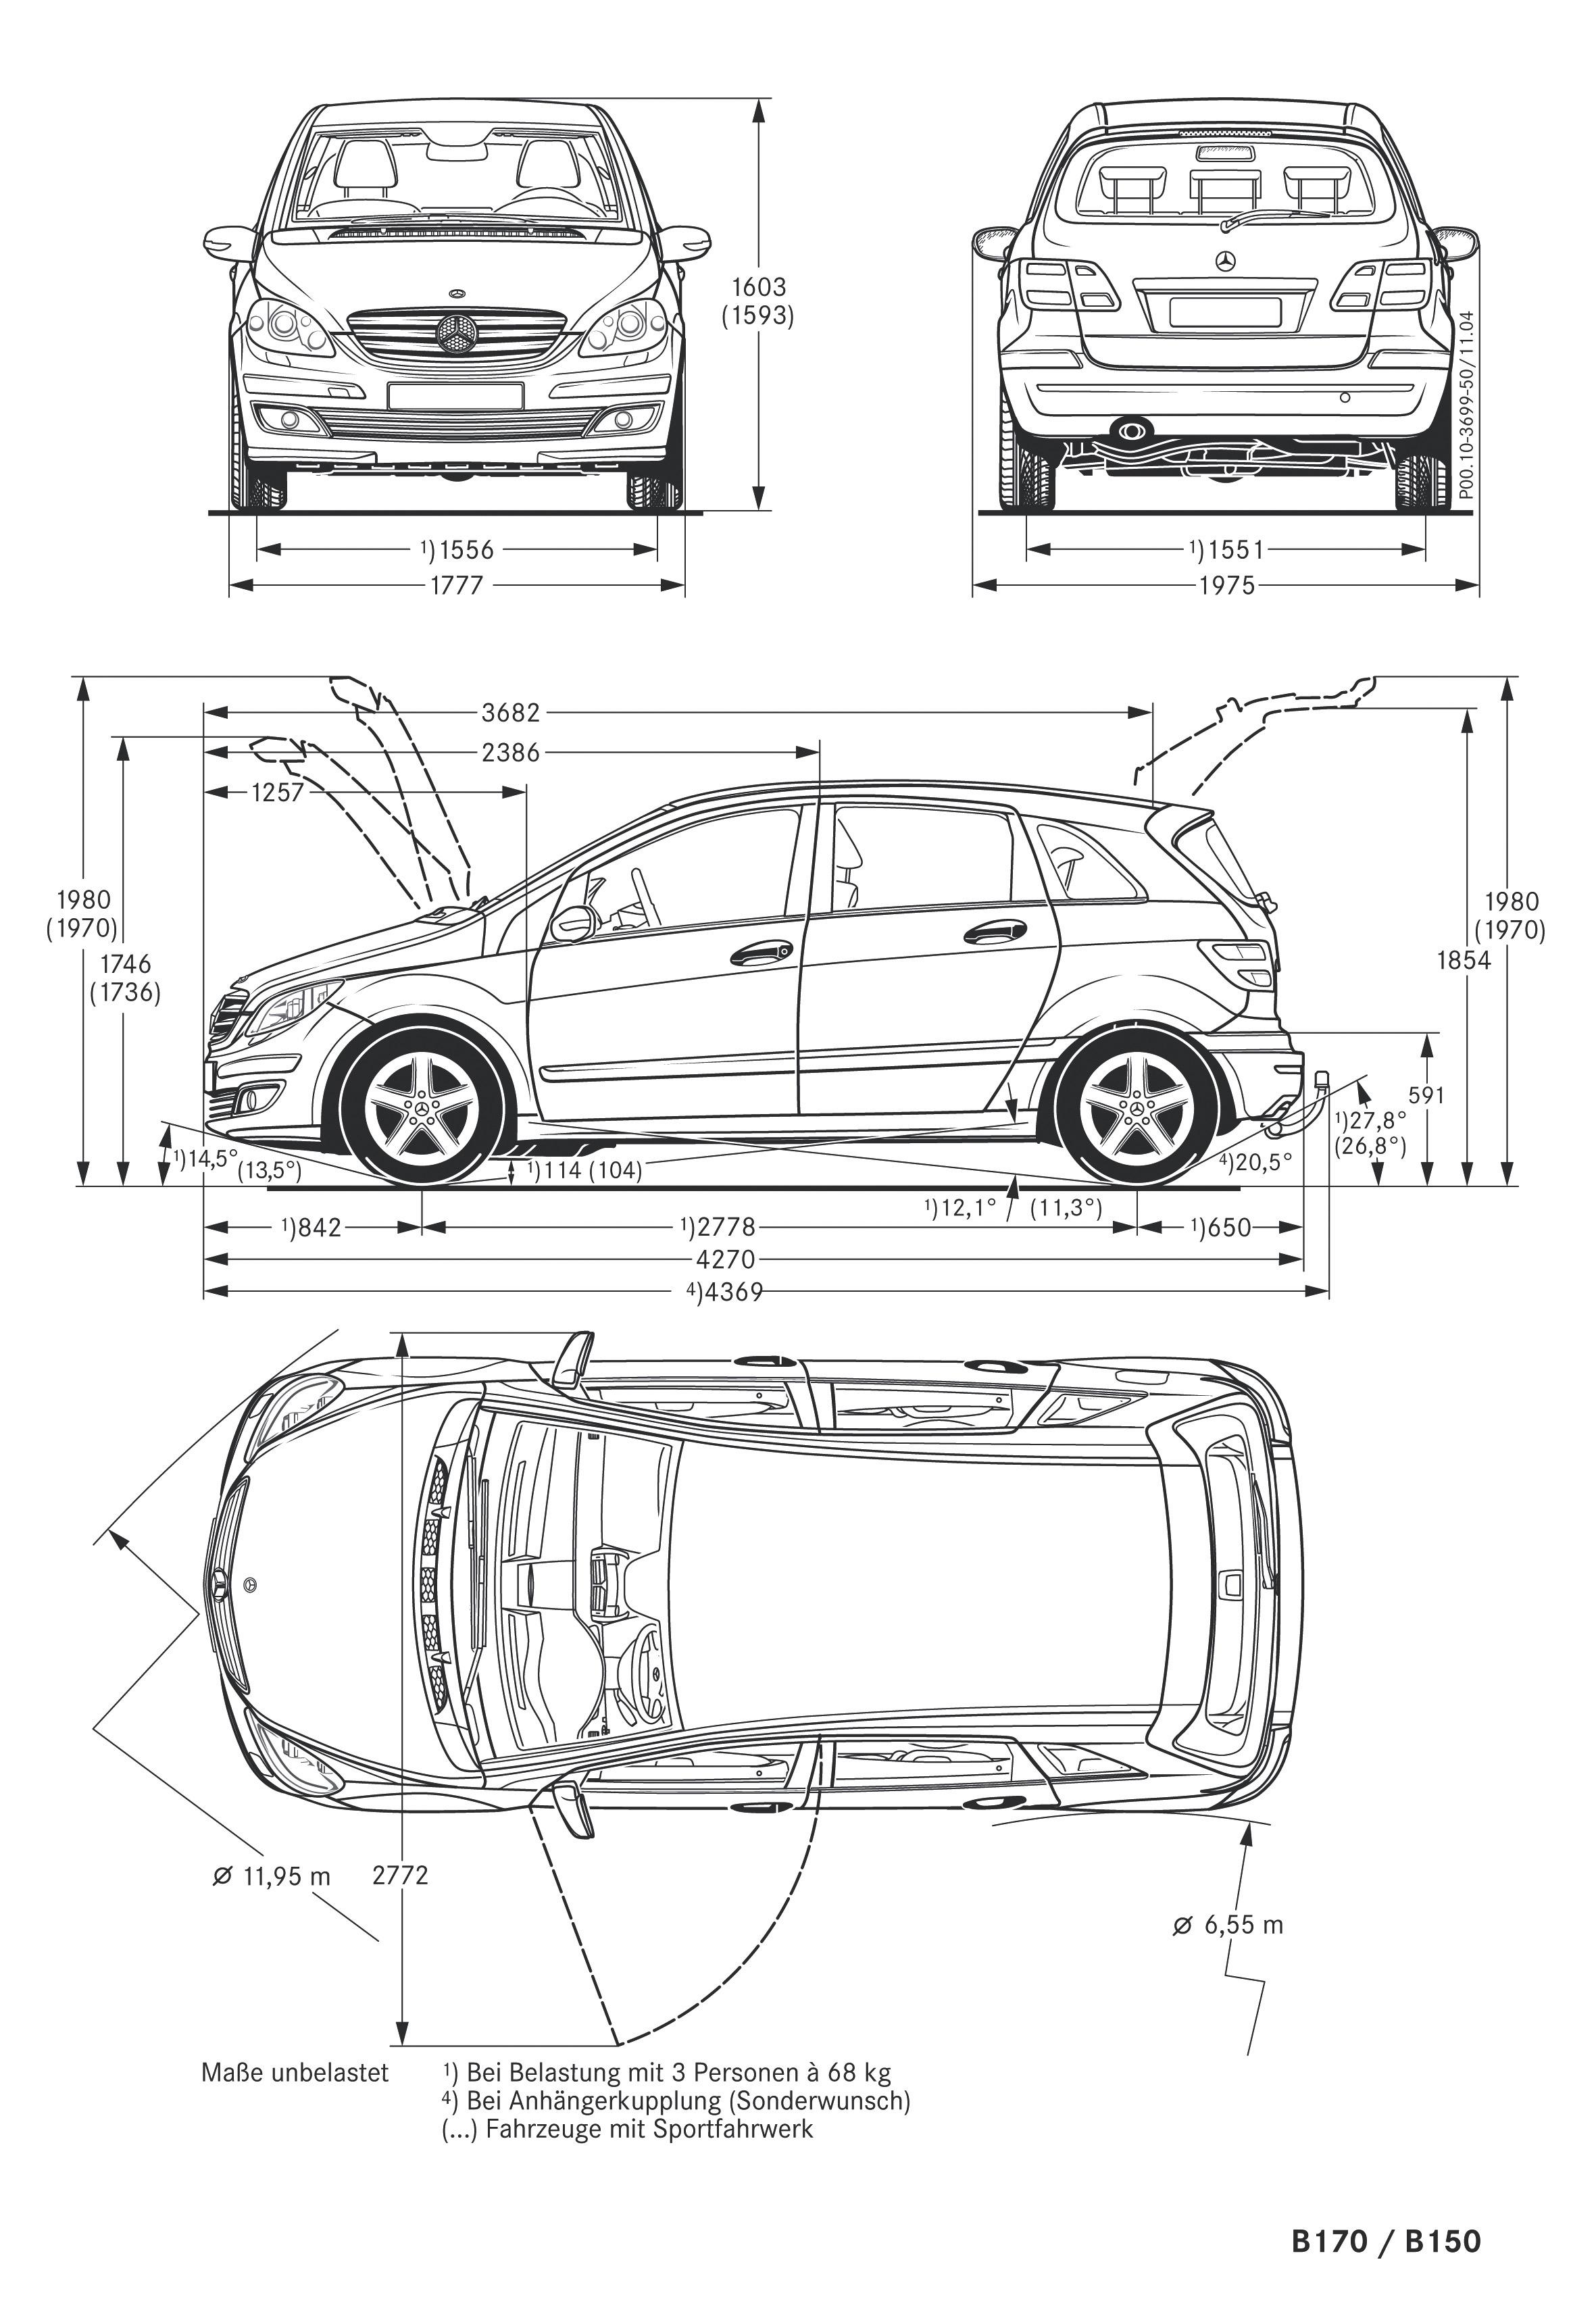 Lamborghini Gallardo Engine Wiring Diagram. Lamborghini